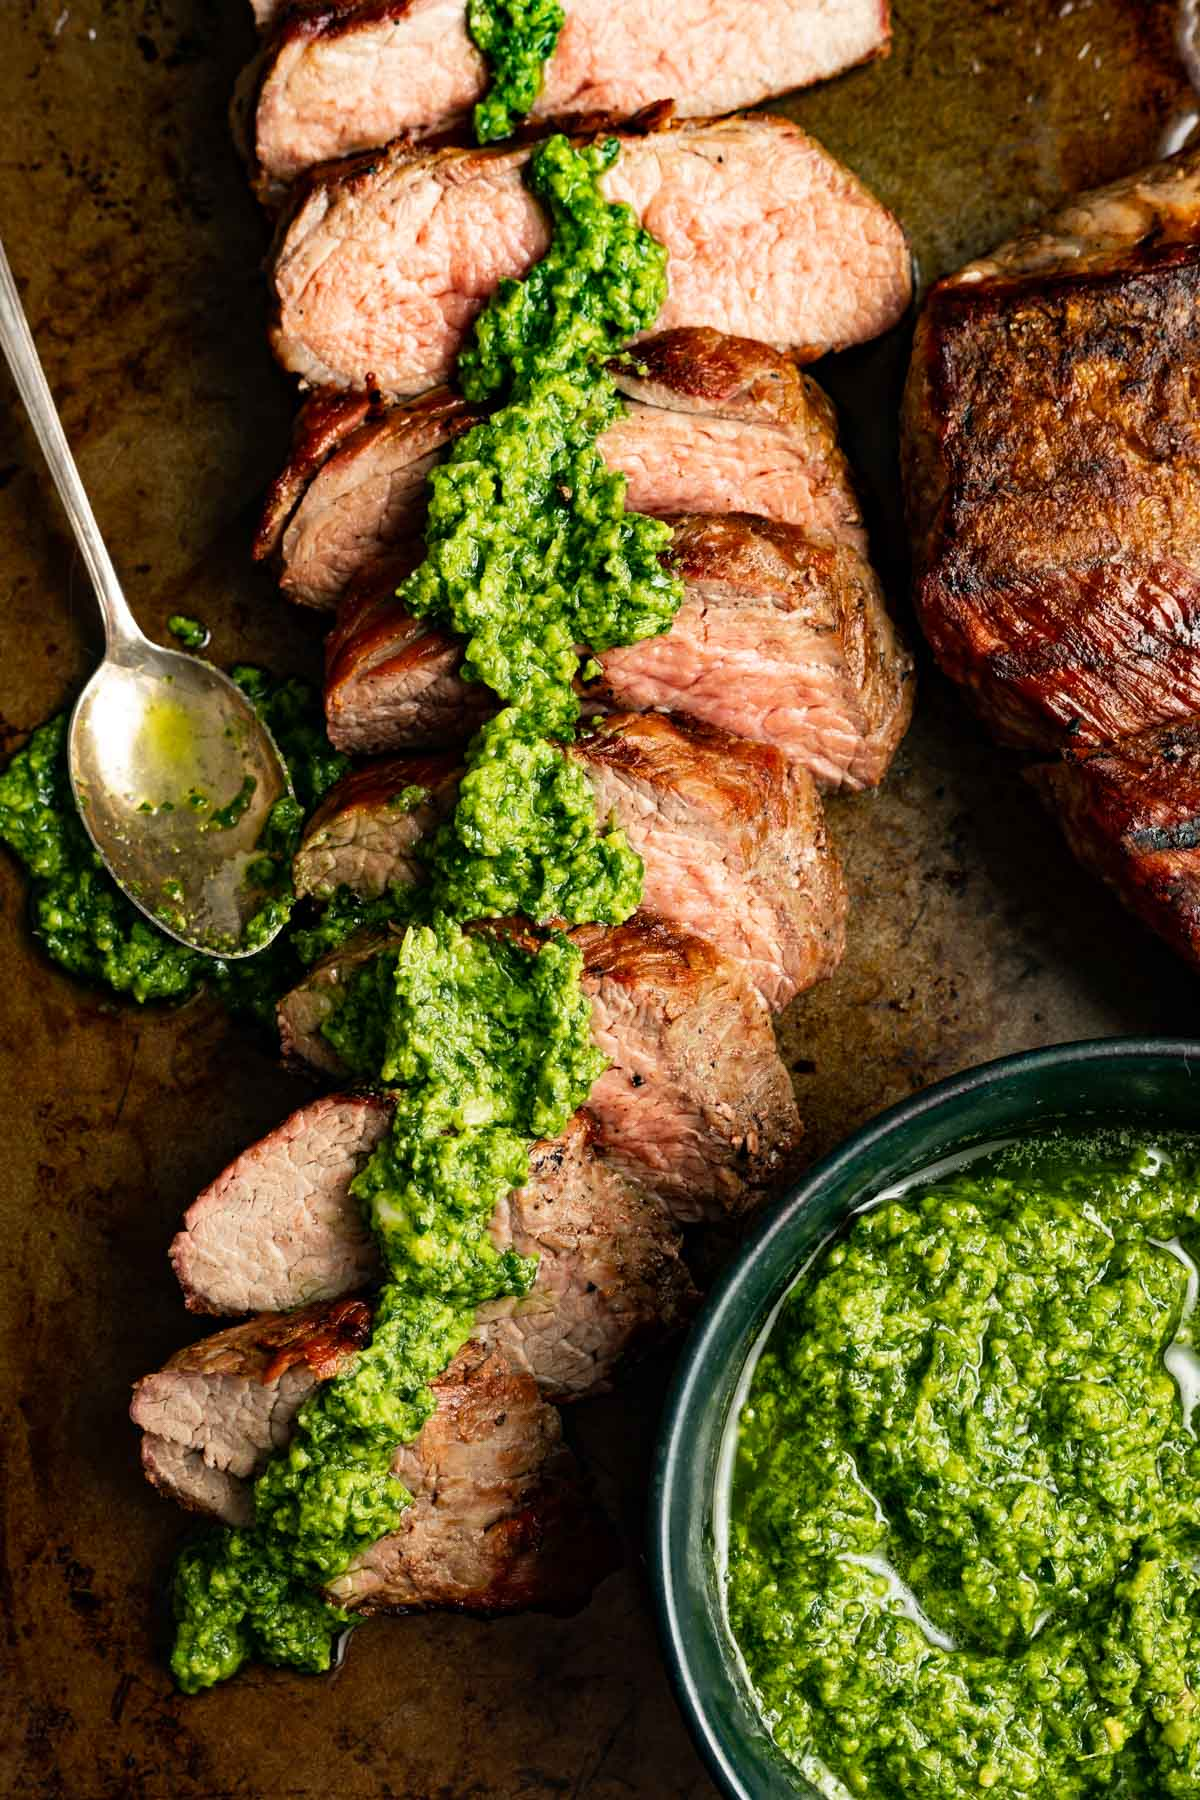 Tri Tip With Creamy Avocado Chimichurri Cast Iron Keto,Flat Iron Steak Cooked